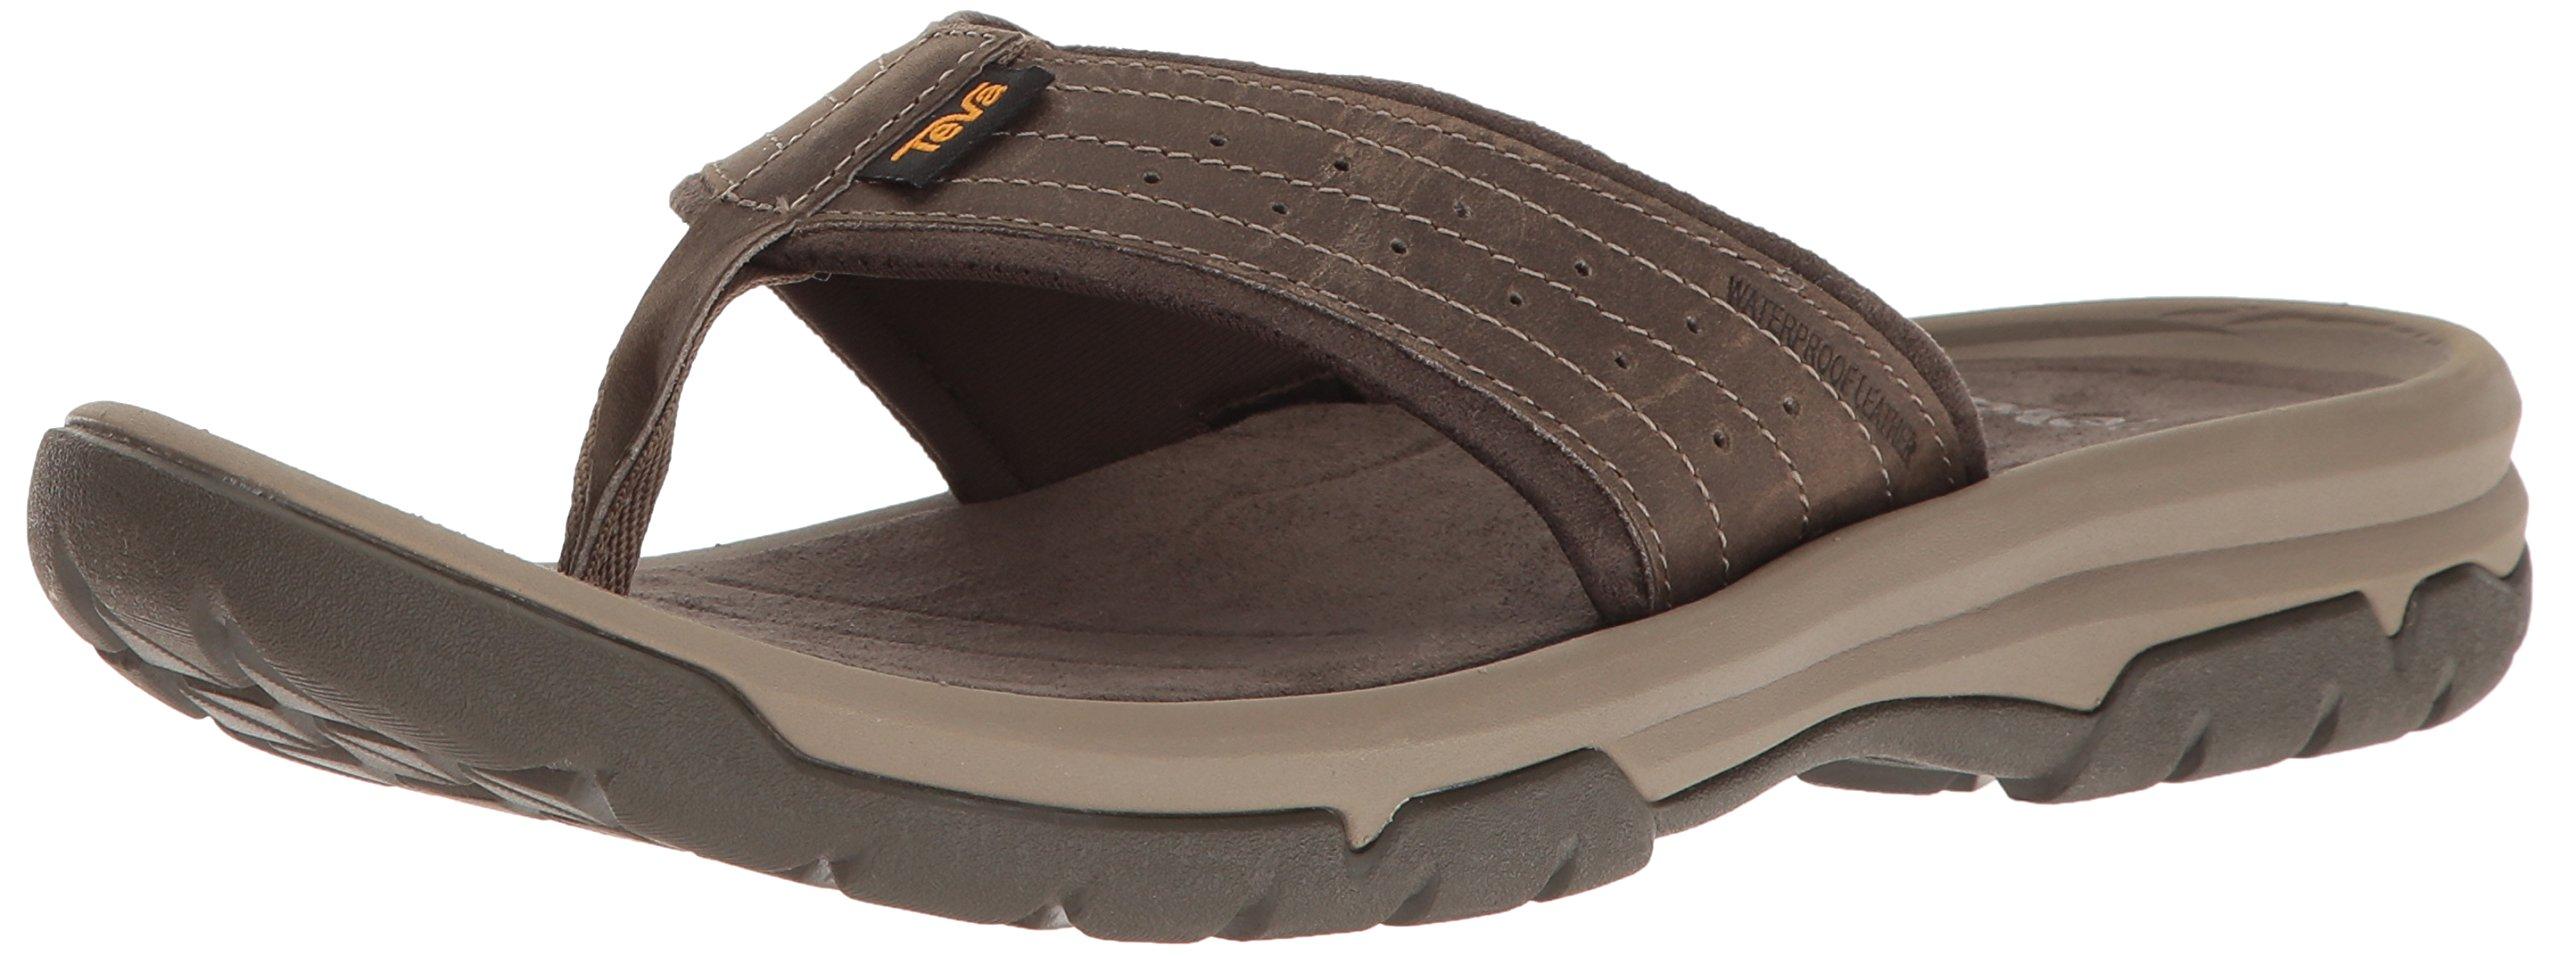 Teva Men's M Langdon Flip Sandal, Walnut, 11 M US by Teva